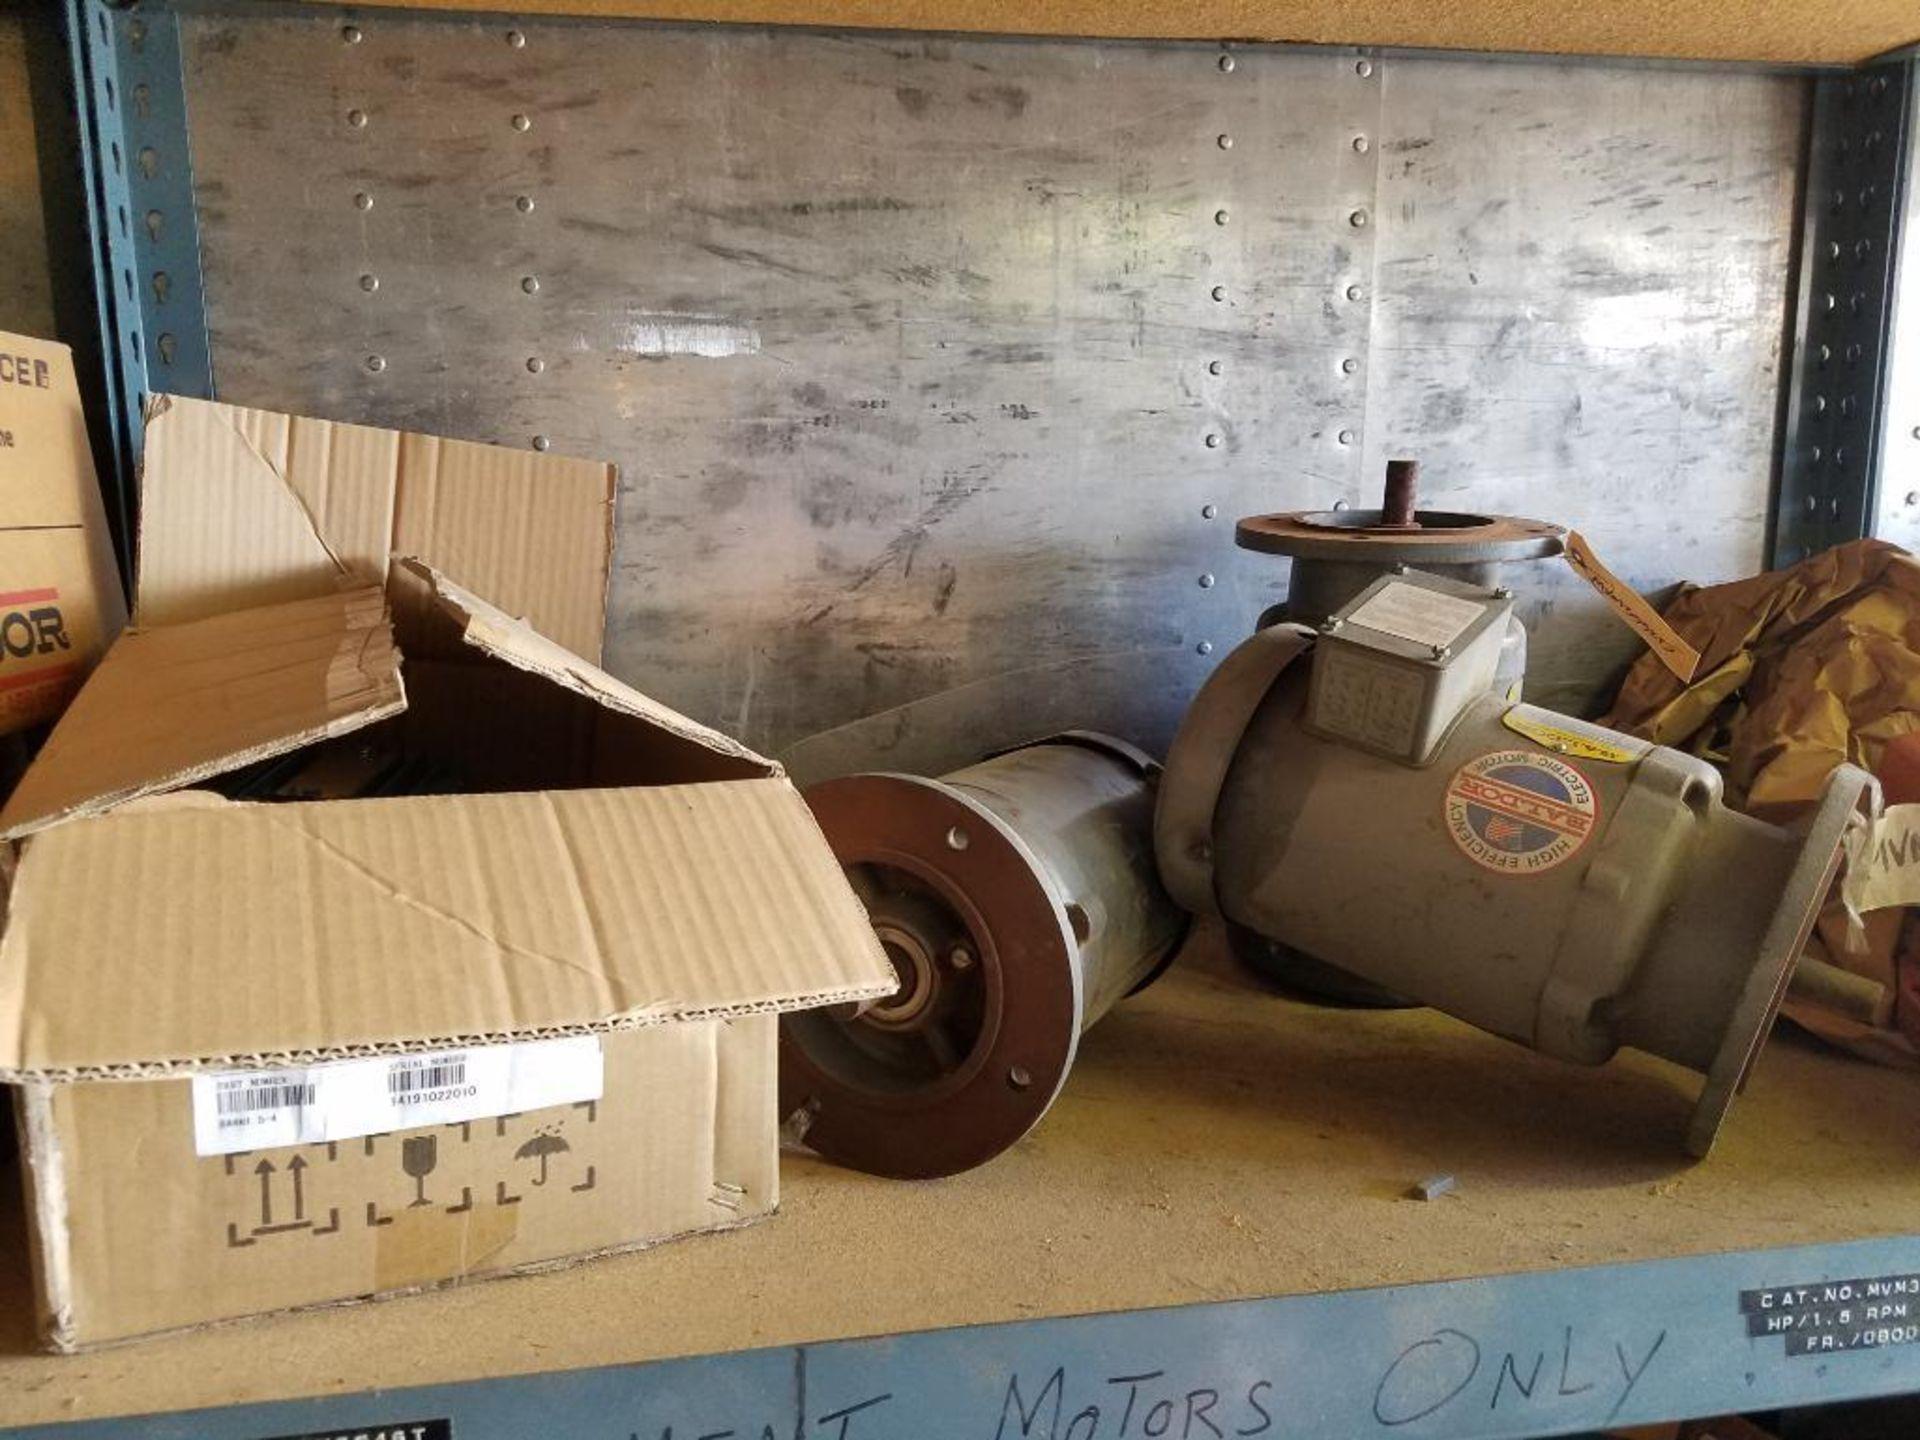 various motors and drives - Image 3 of 3